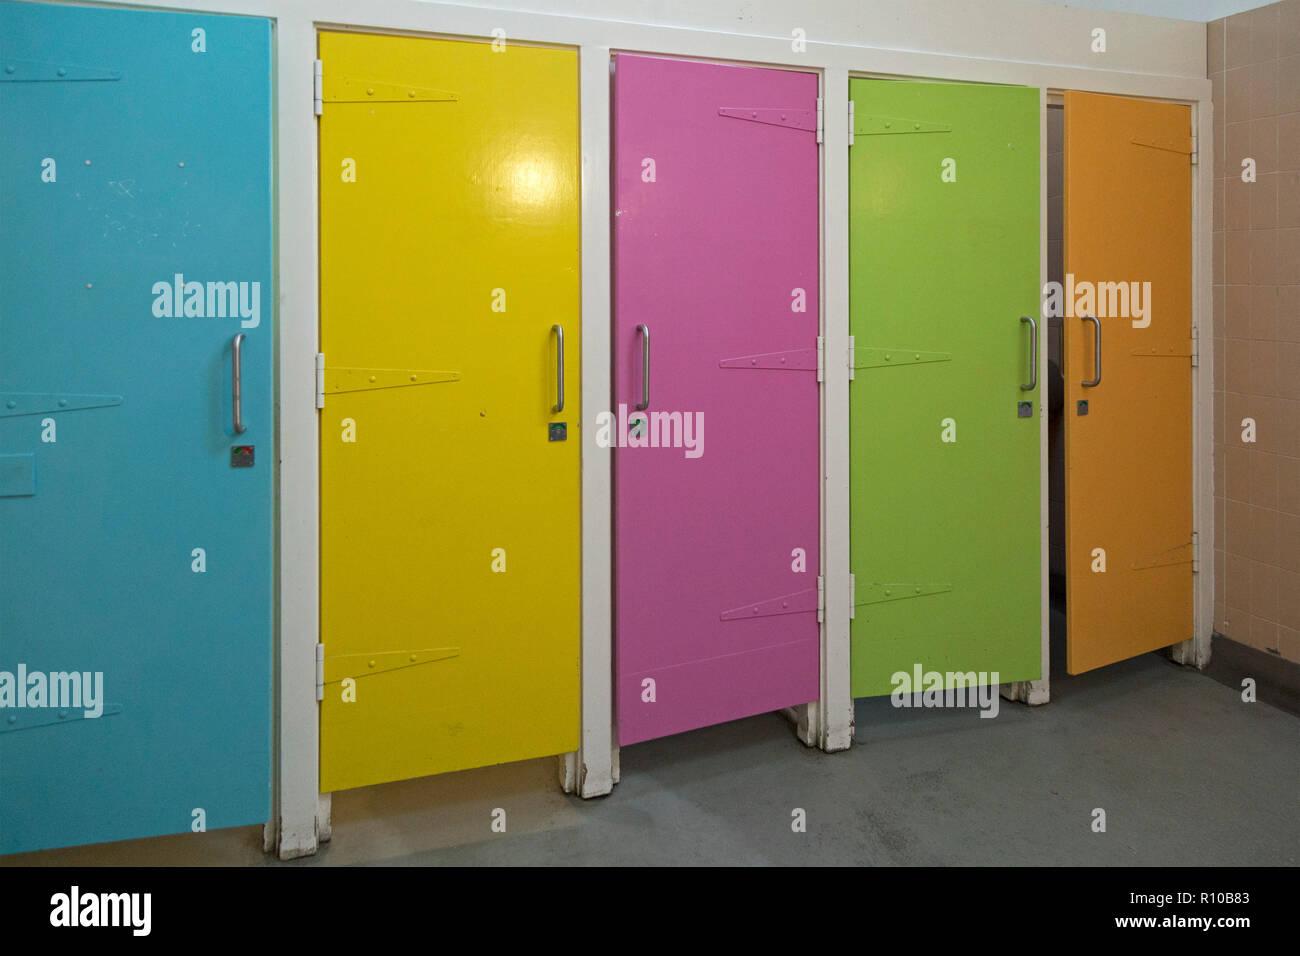 Herrentoiletten, St. Ives, Cornwall, Inghilterra, Großbritannien | uomini di toilette, St. Ives, Cornwall, Inghilterra, Gran Bretagna Immagini Stock